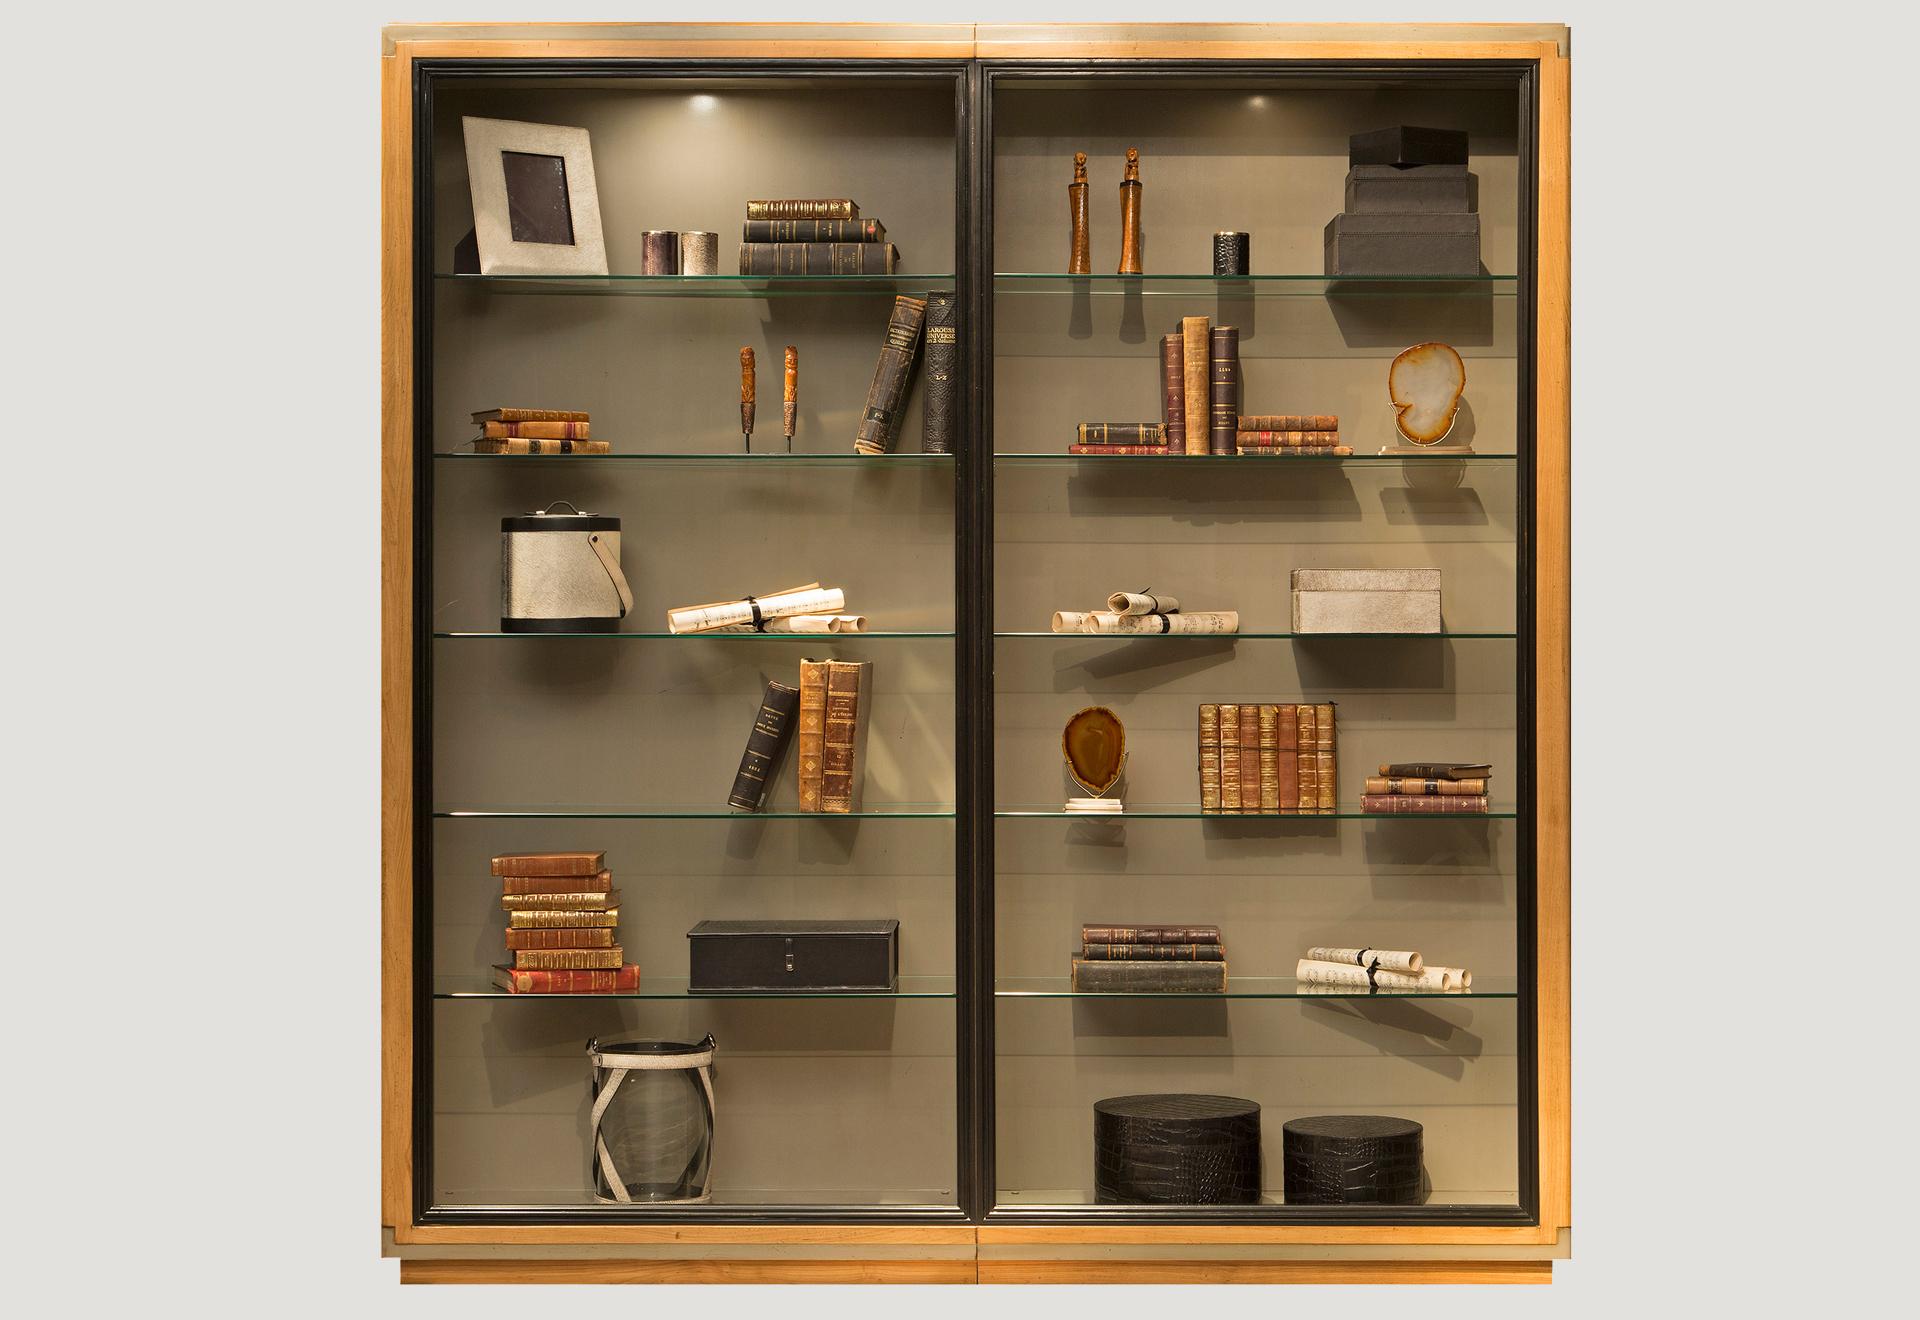 spaces luxe living philippine tatler. Black Bedroom Furniture Sets. Home Design Ideas